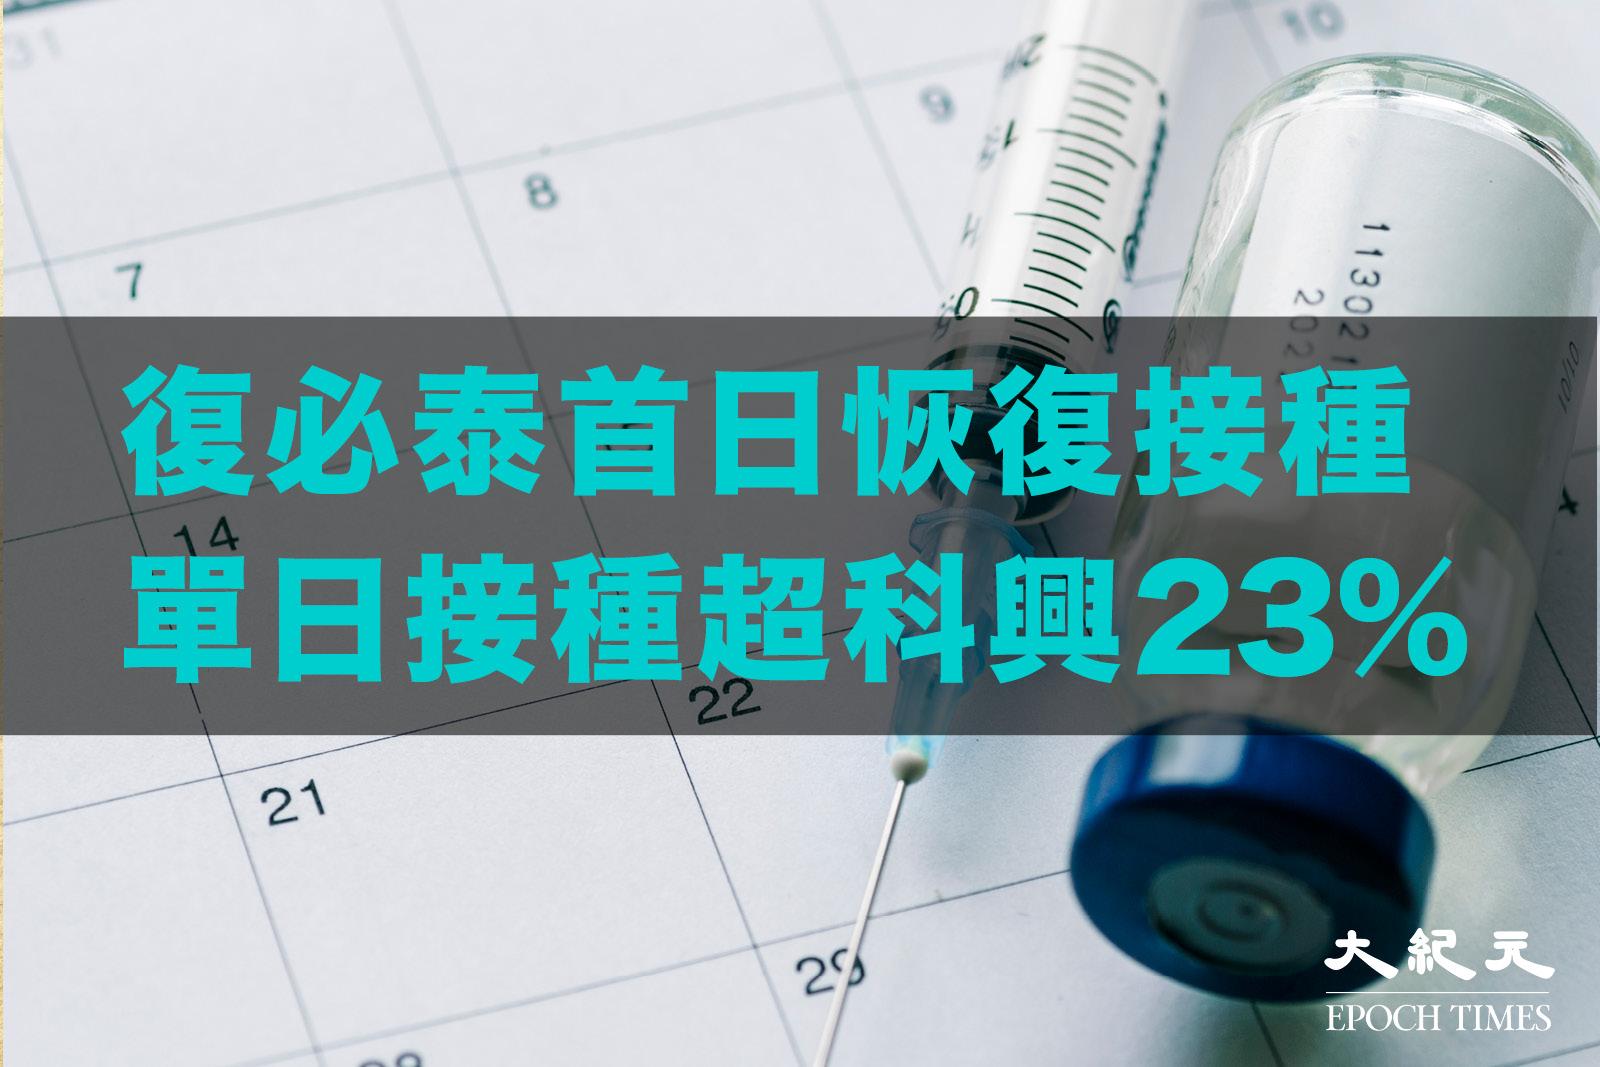 BioNTech復必泰昨日(4月5日)首次恢復接種,單日接種復必泰的市民超過接種科興23%。(大紀元製圖)